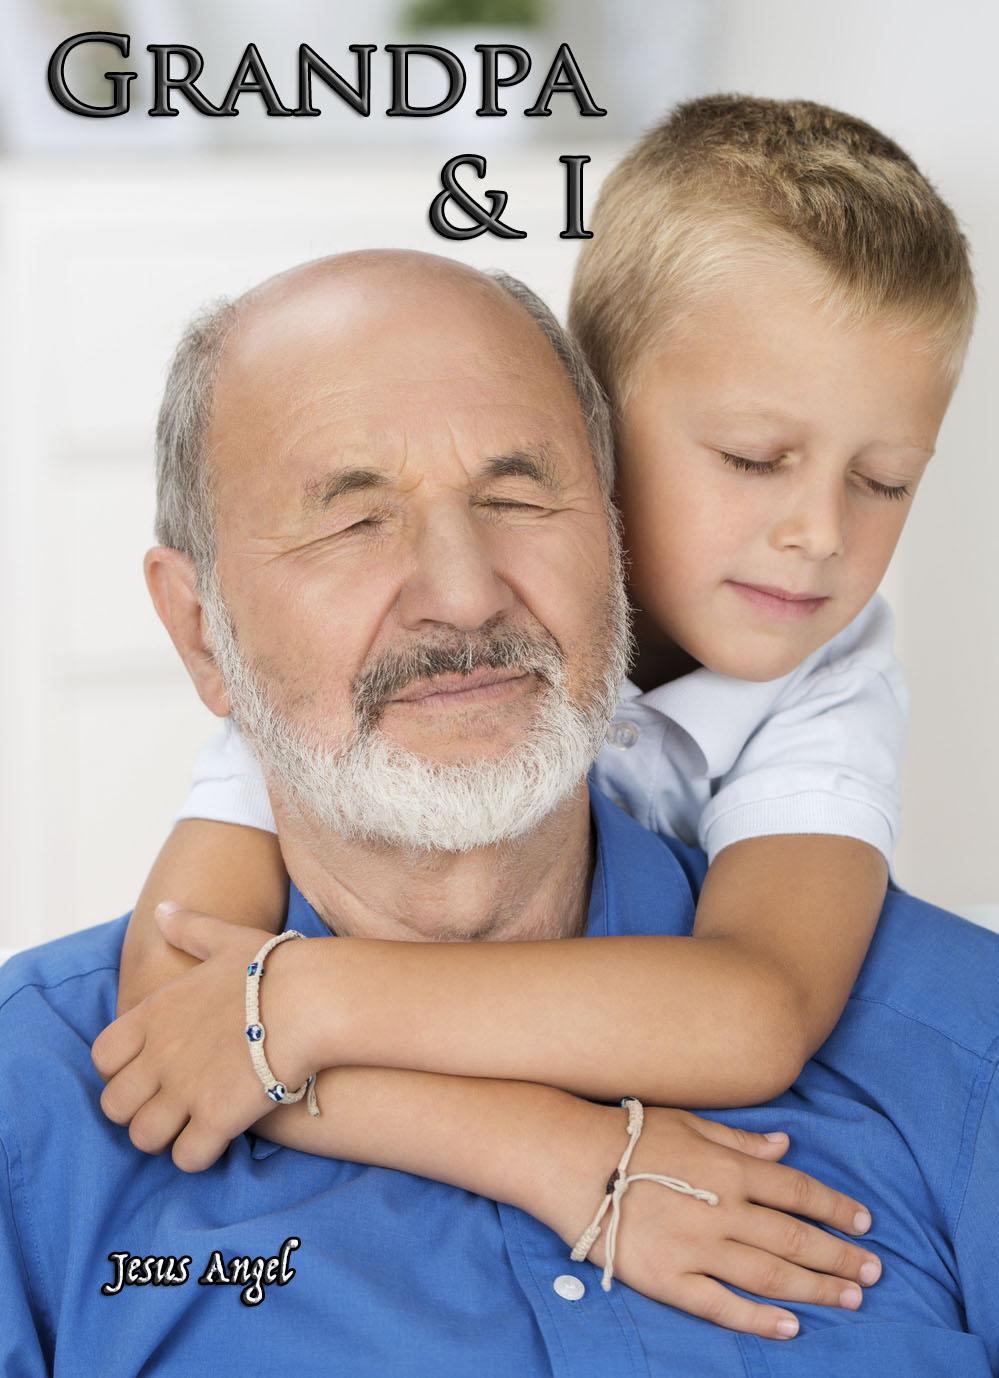 Mu favorite grandchil, Julian, loved his grandpa all his life long.